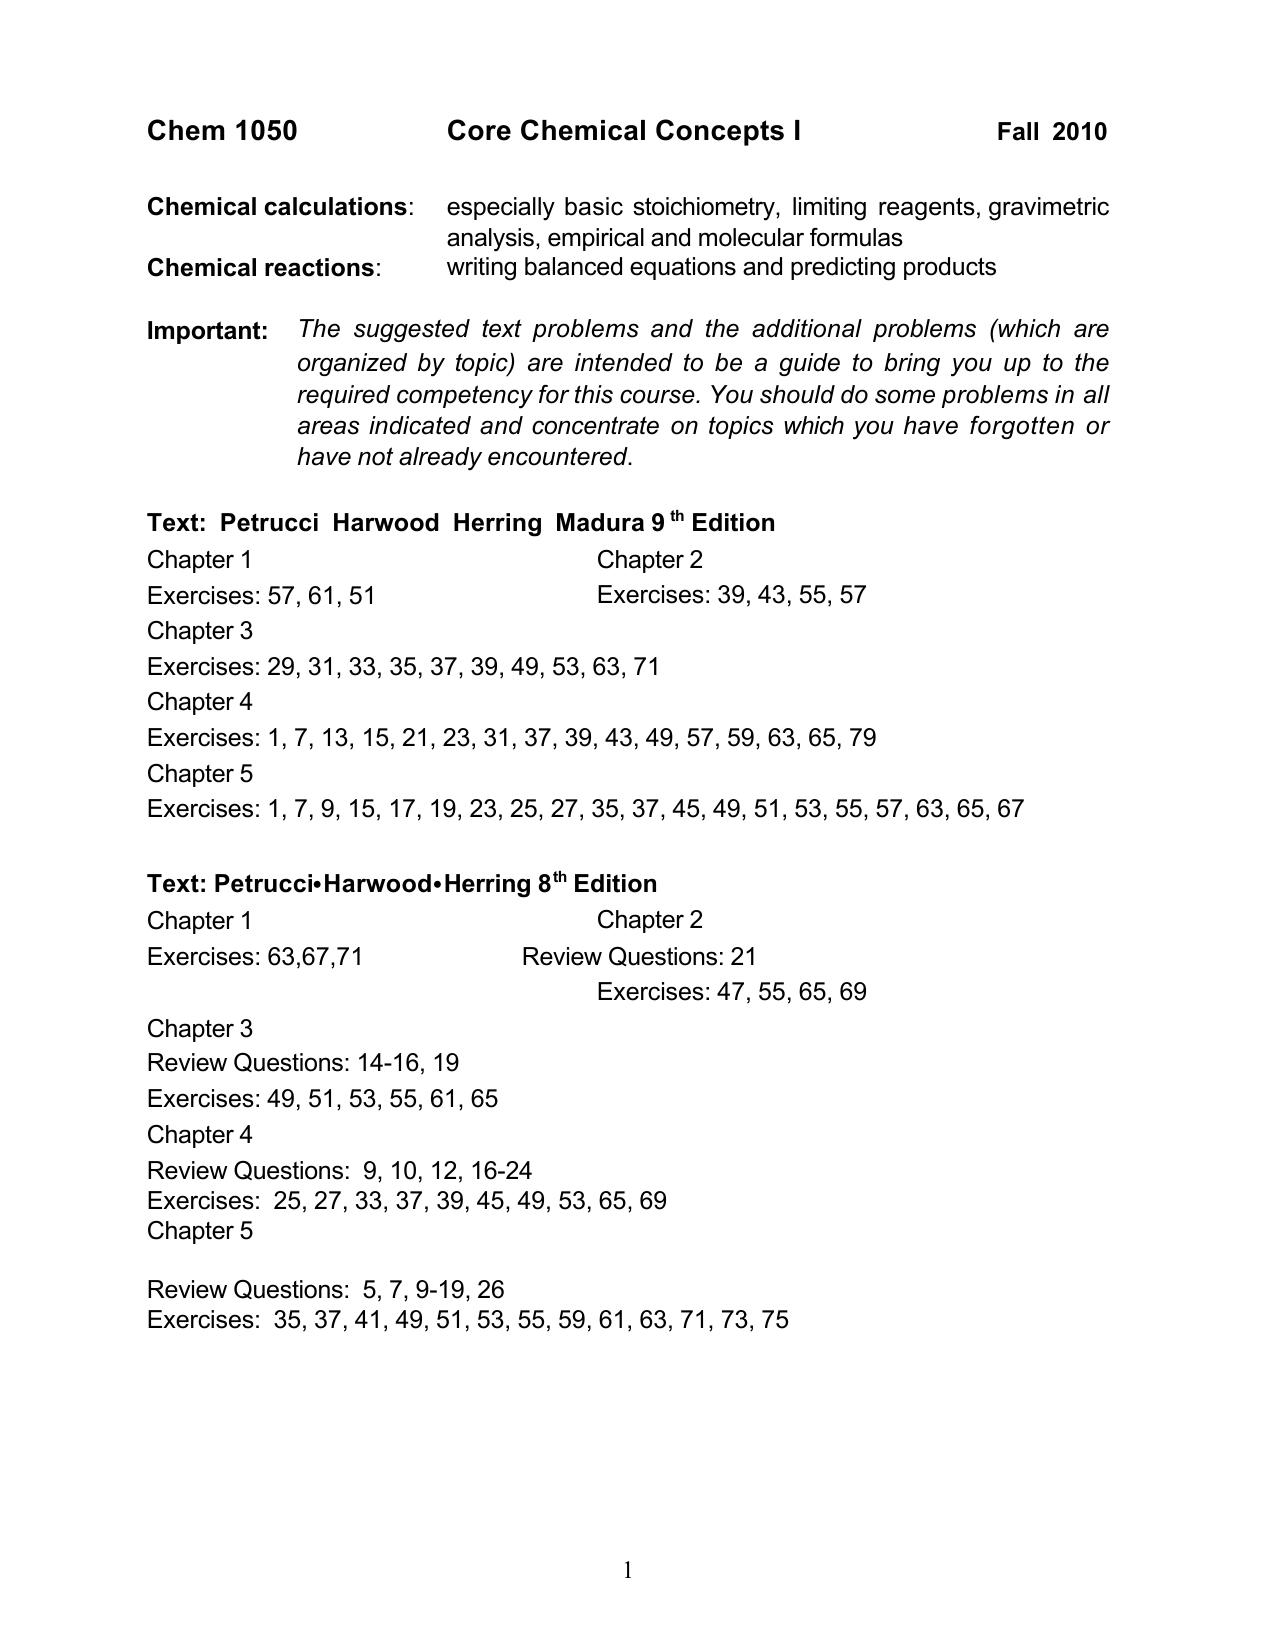 Basic Chemical Concepts I